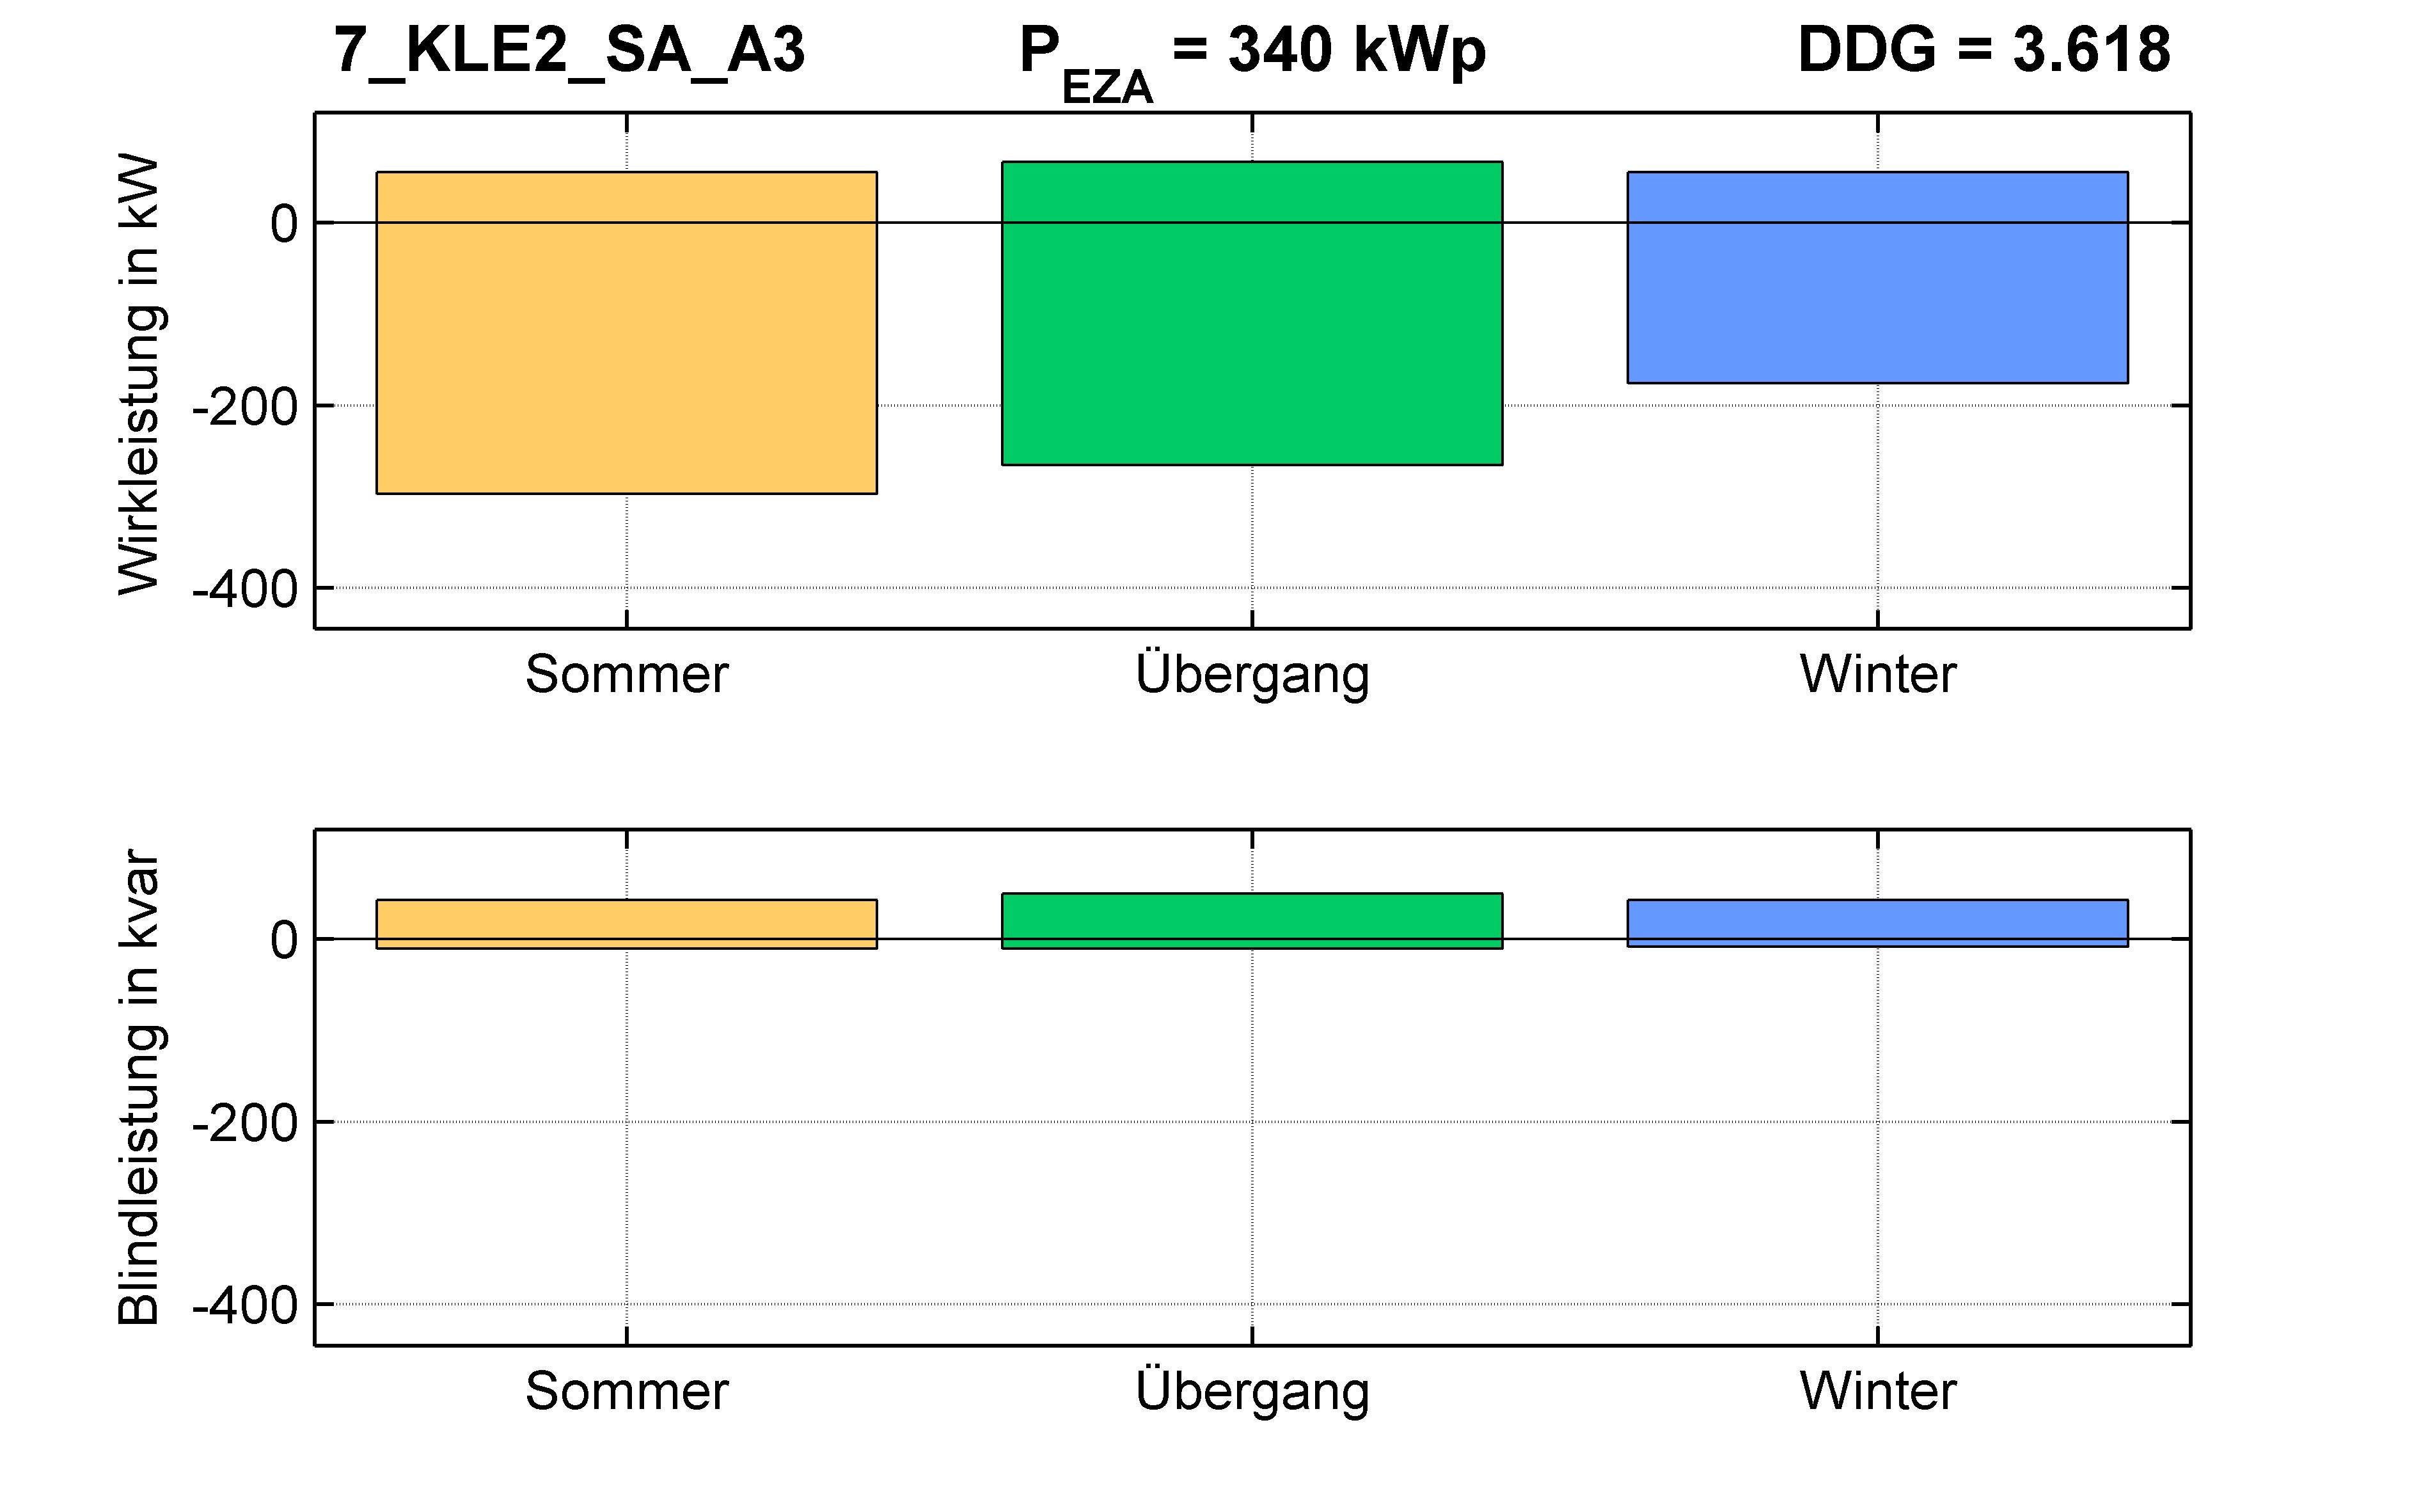 KLE2 | Längsregler (SA) A3 | PQ-Bilanz